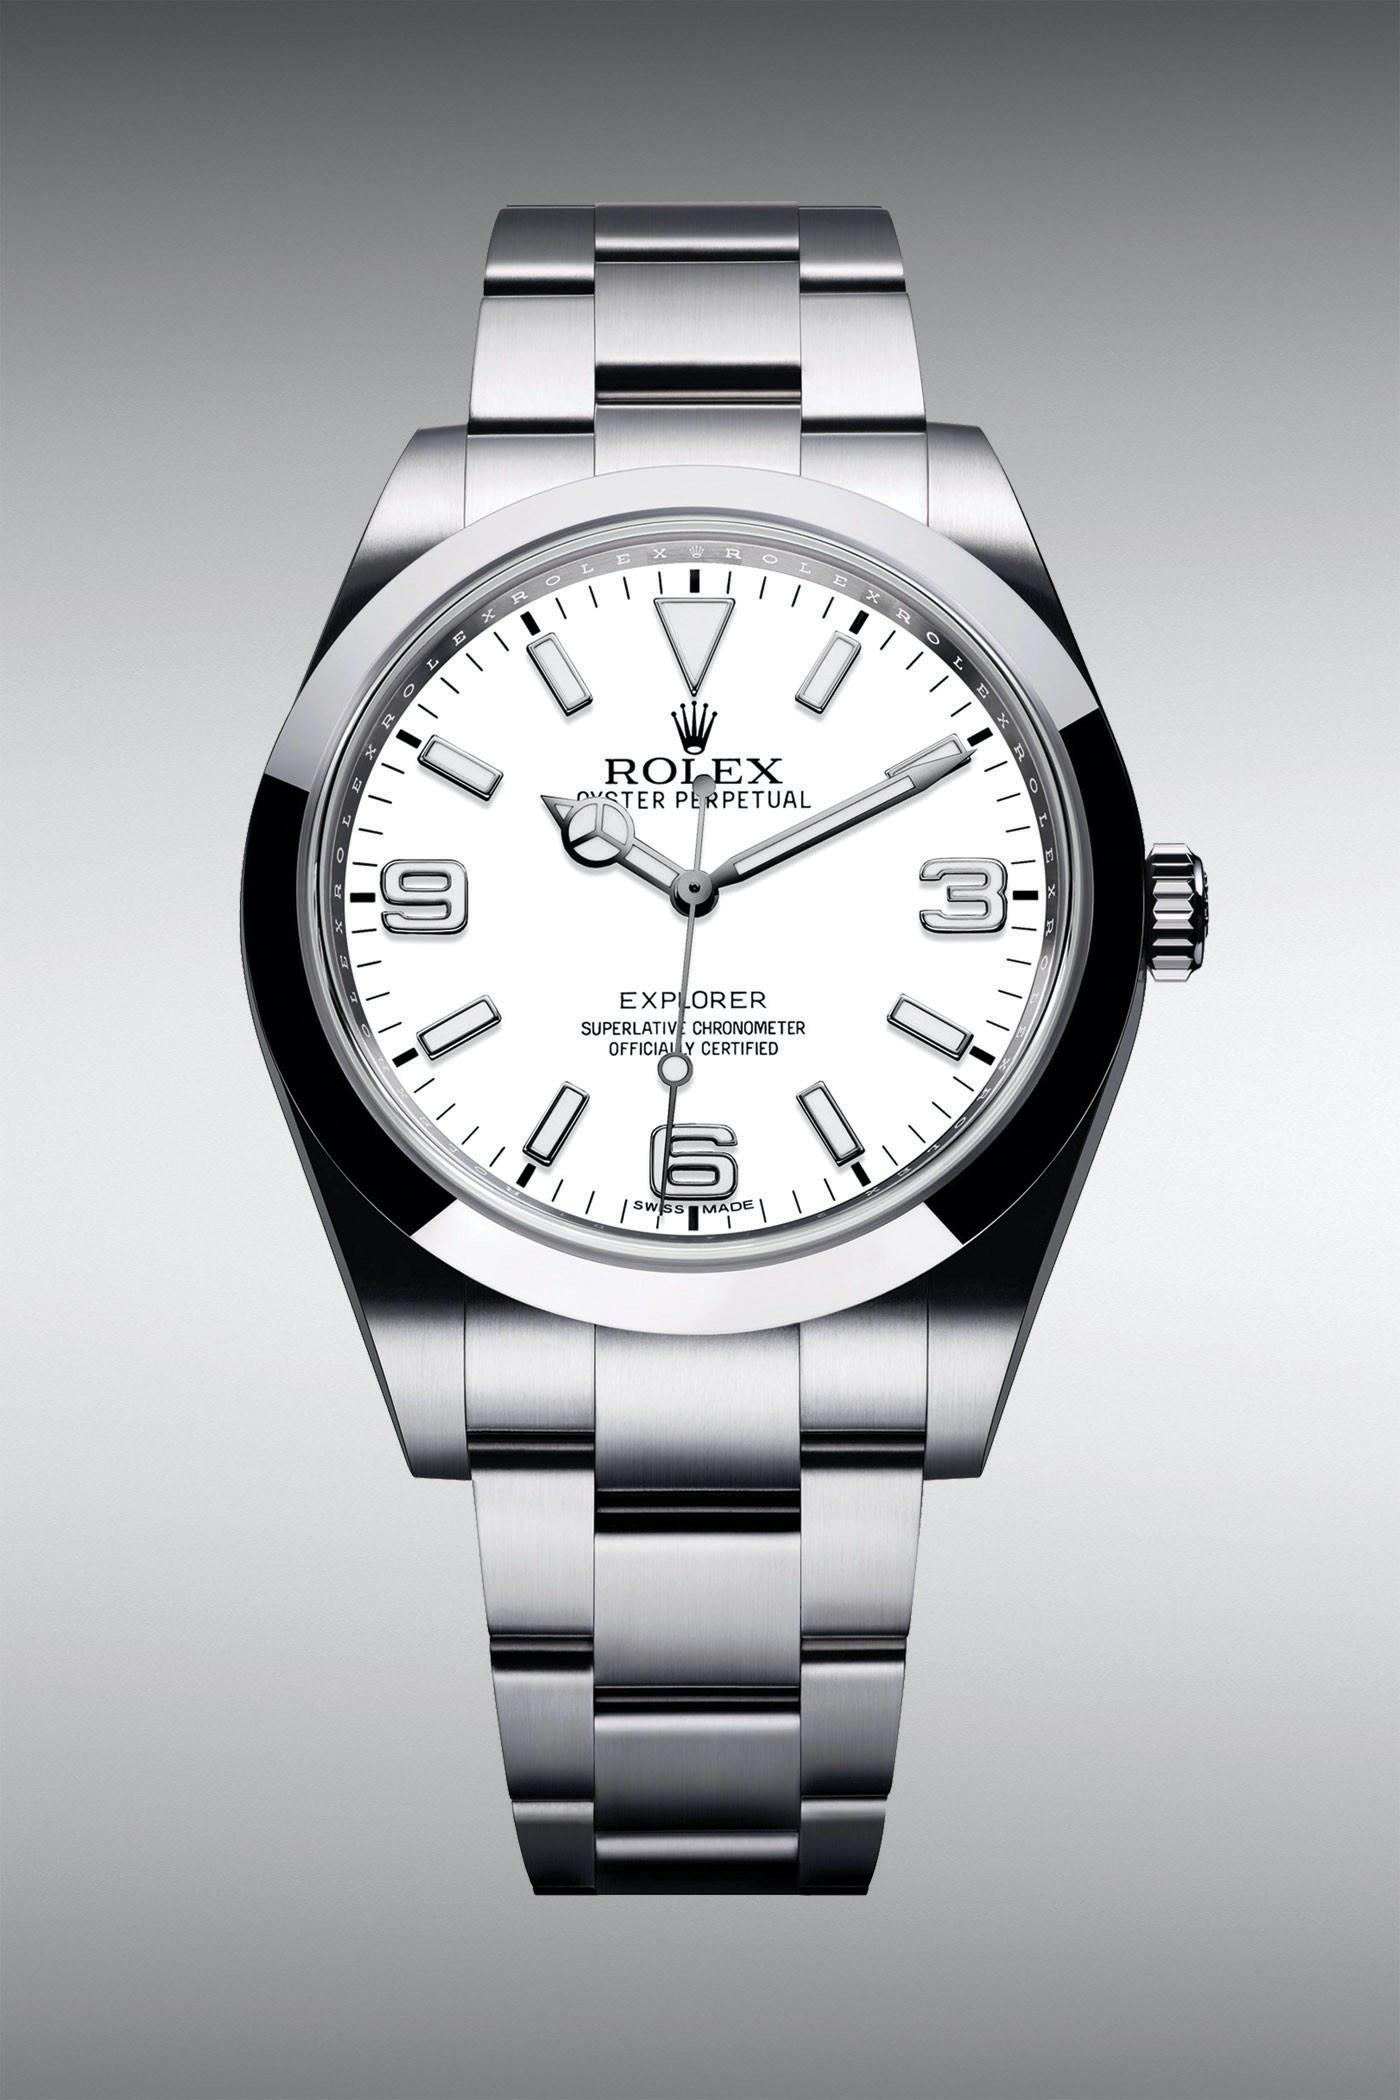 Rolex Explorer 39 Polar White Dial Oyster Bracelet - Rolex Baselworld 2020 - Rolex 2020 Predictions